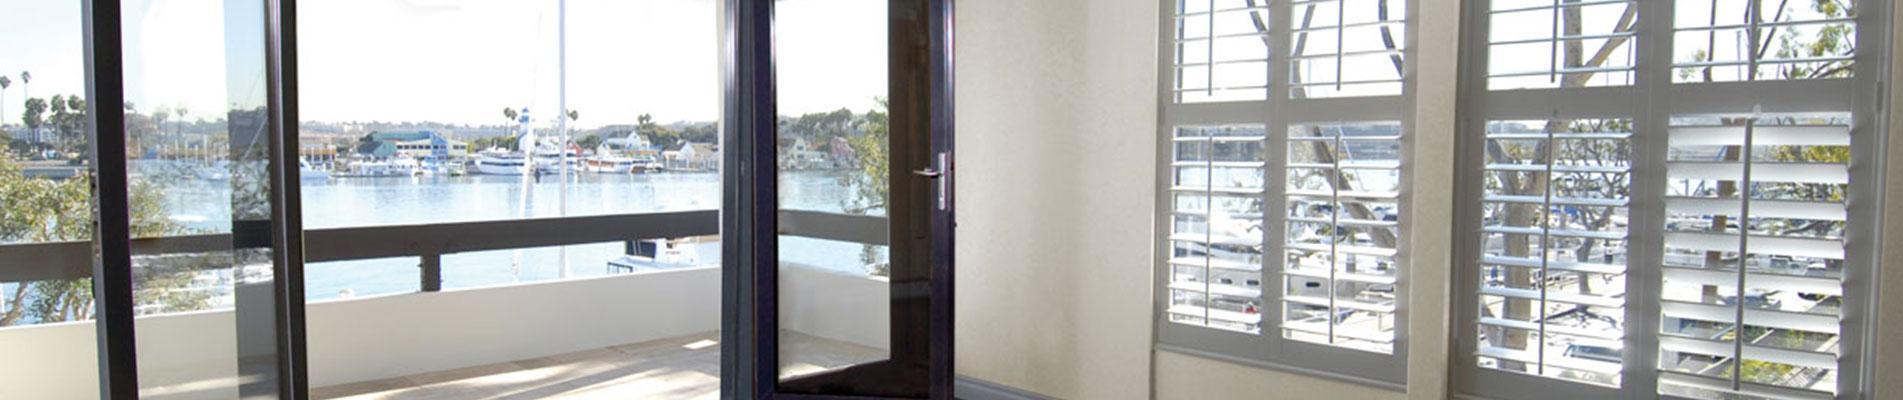 Casement Windows image